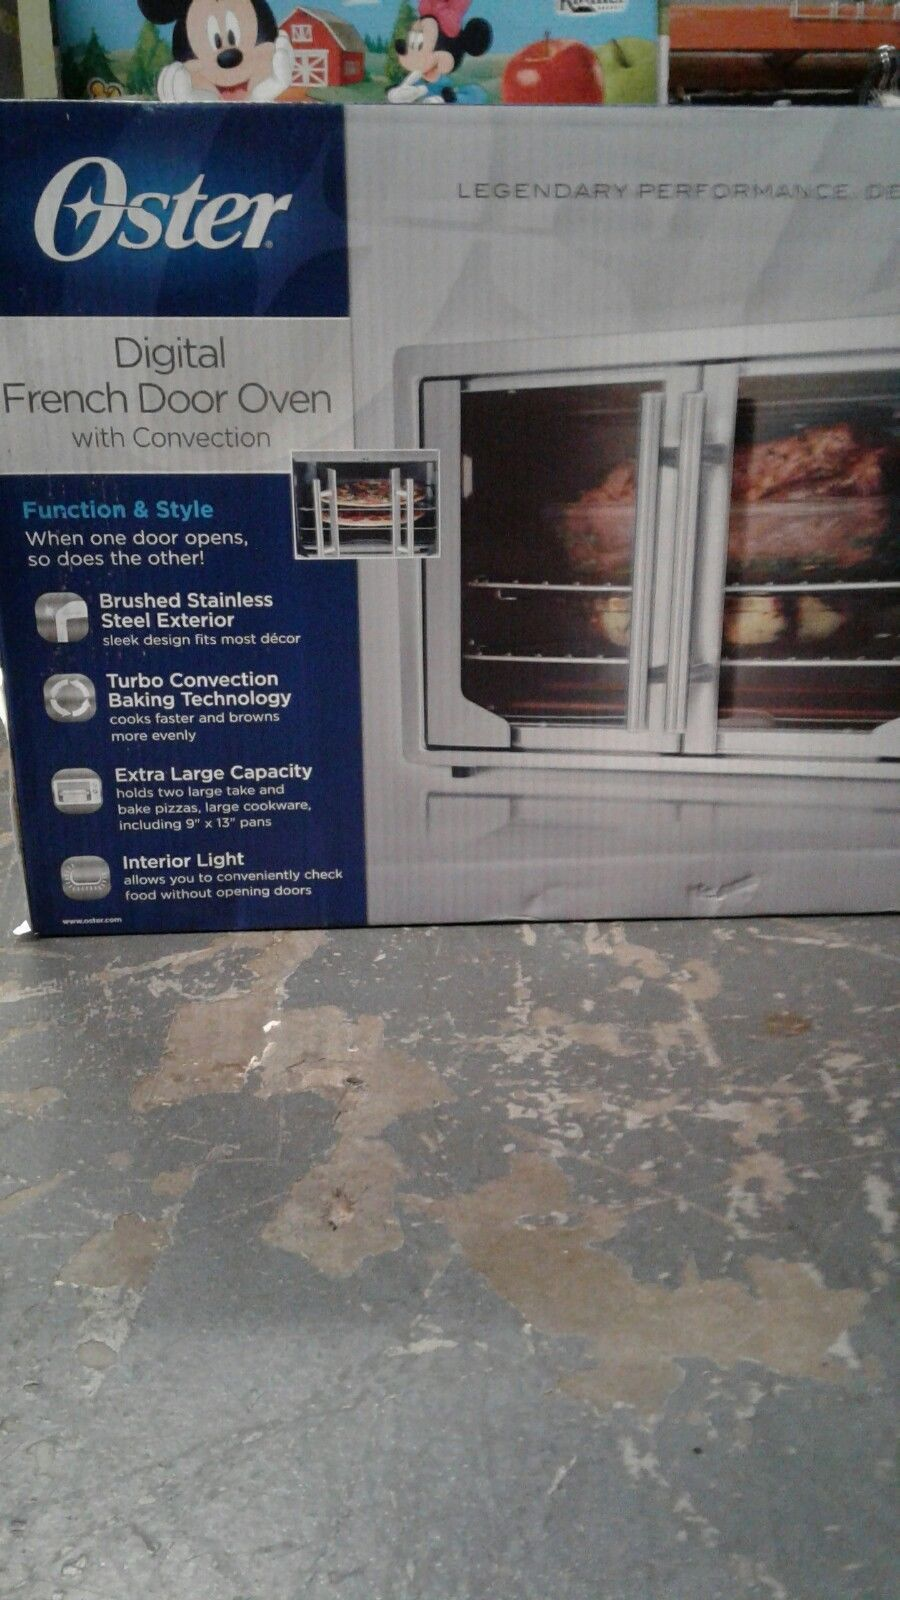 Oster Tssttvfddg Digital French Door Oven Stainless Steel Extra